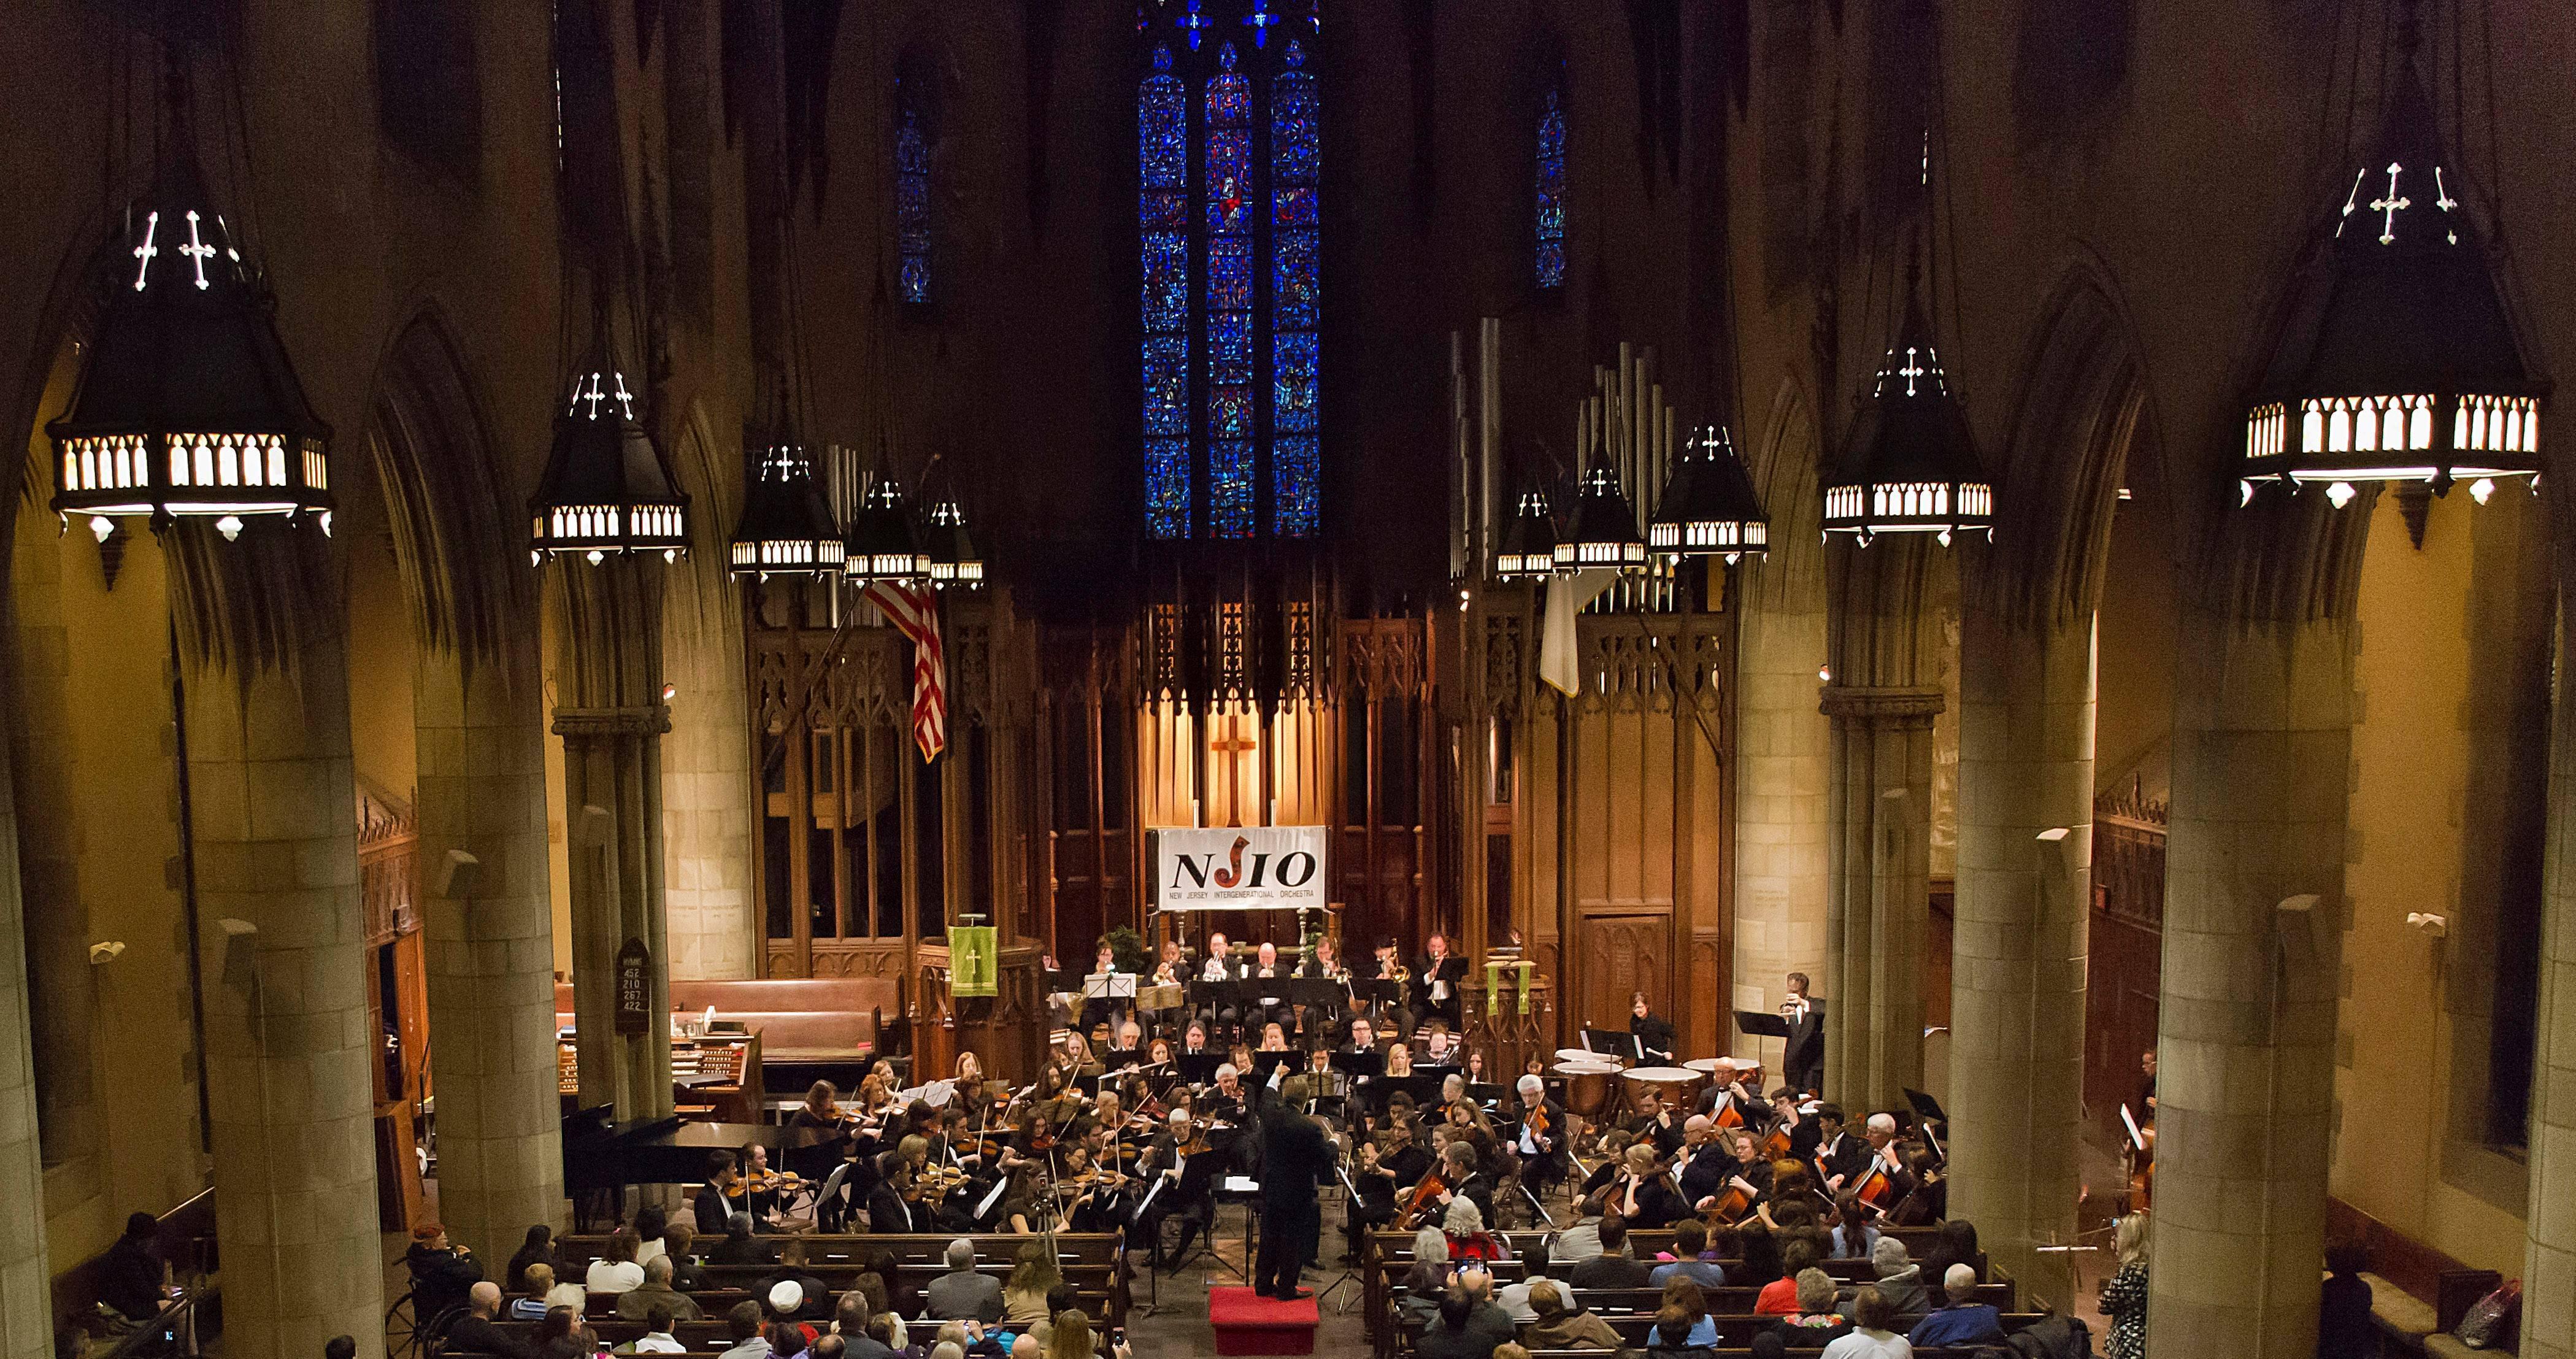 f9ae6a982371f052310c_Photo_2_-_NJIO_performing_in_Plainfield_s_magnificent_Crescent_Avenue_Presbyterian_Church.jpg